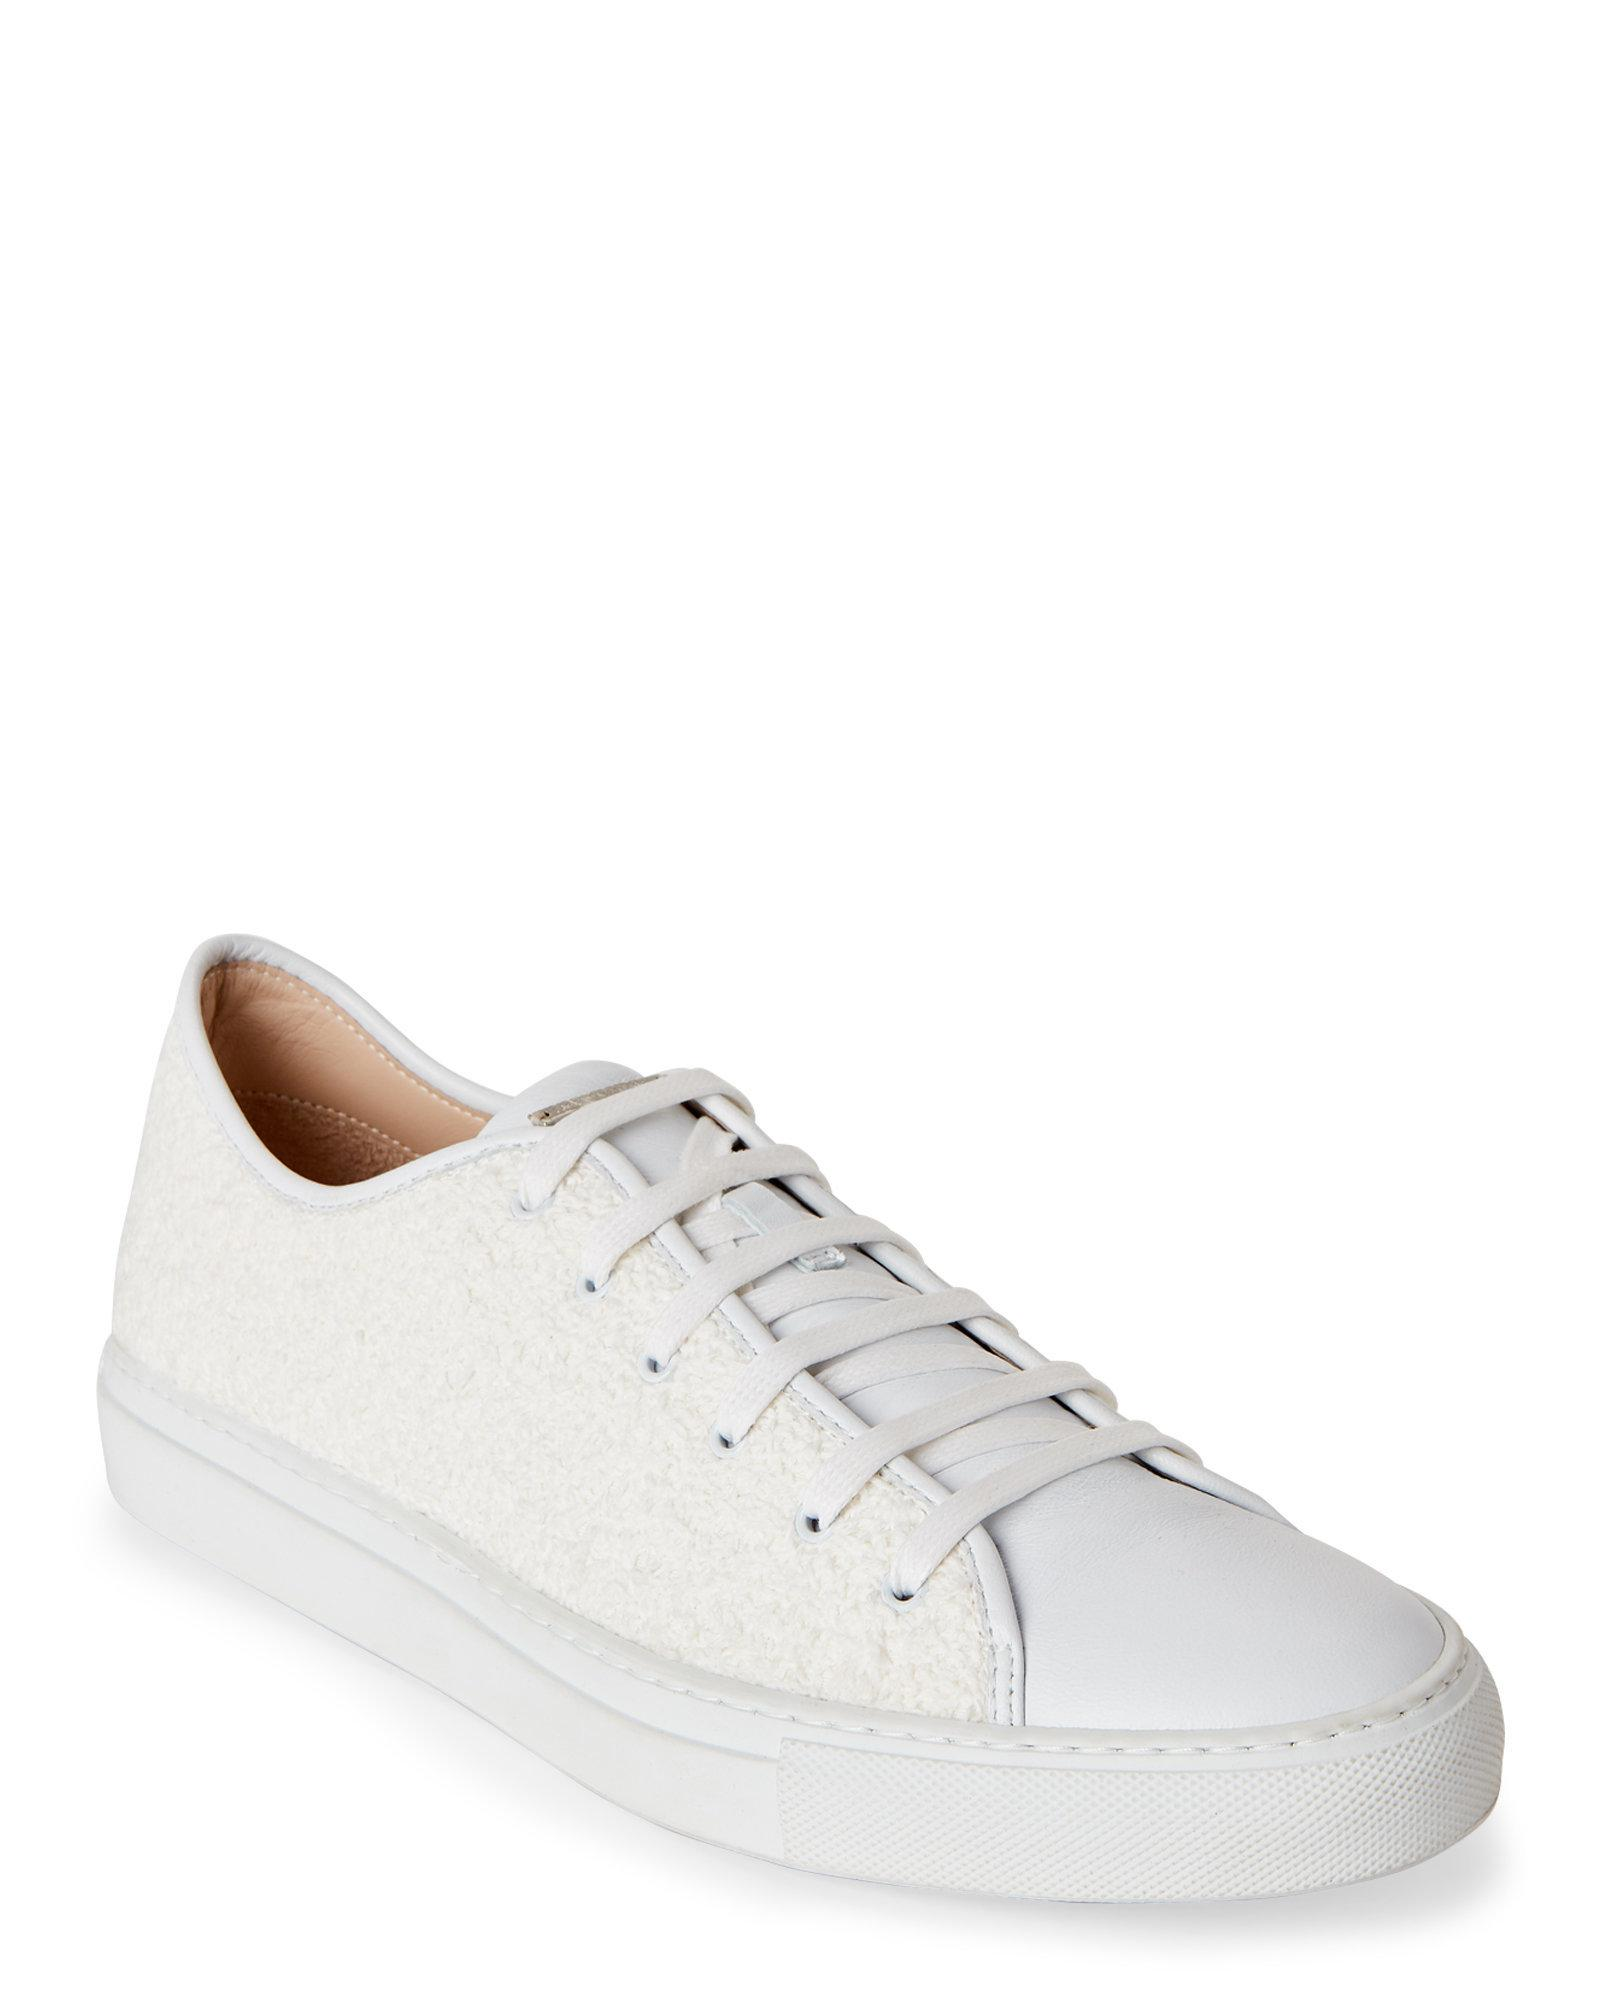 embellished hi-top sneakers - Black Fabiana Filippi KWhOrJ